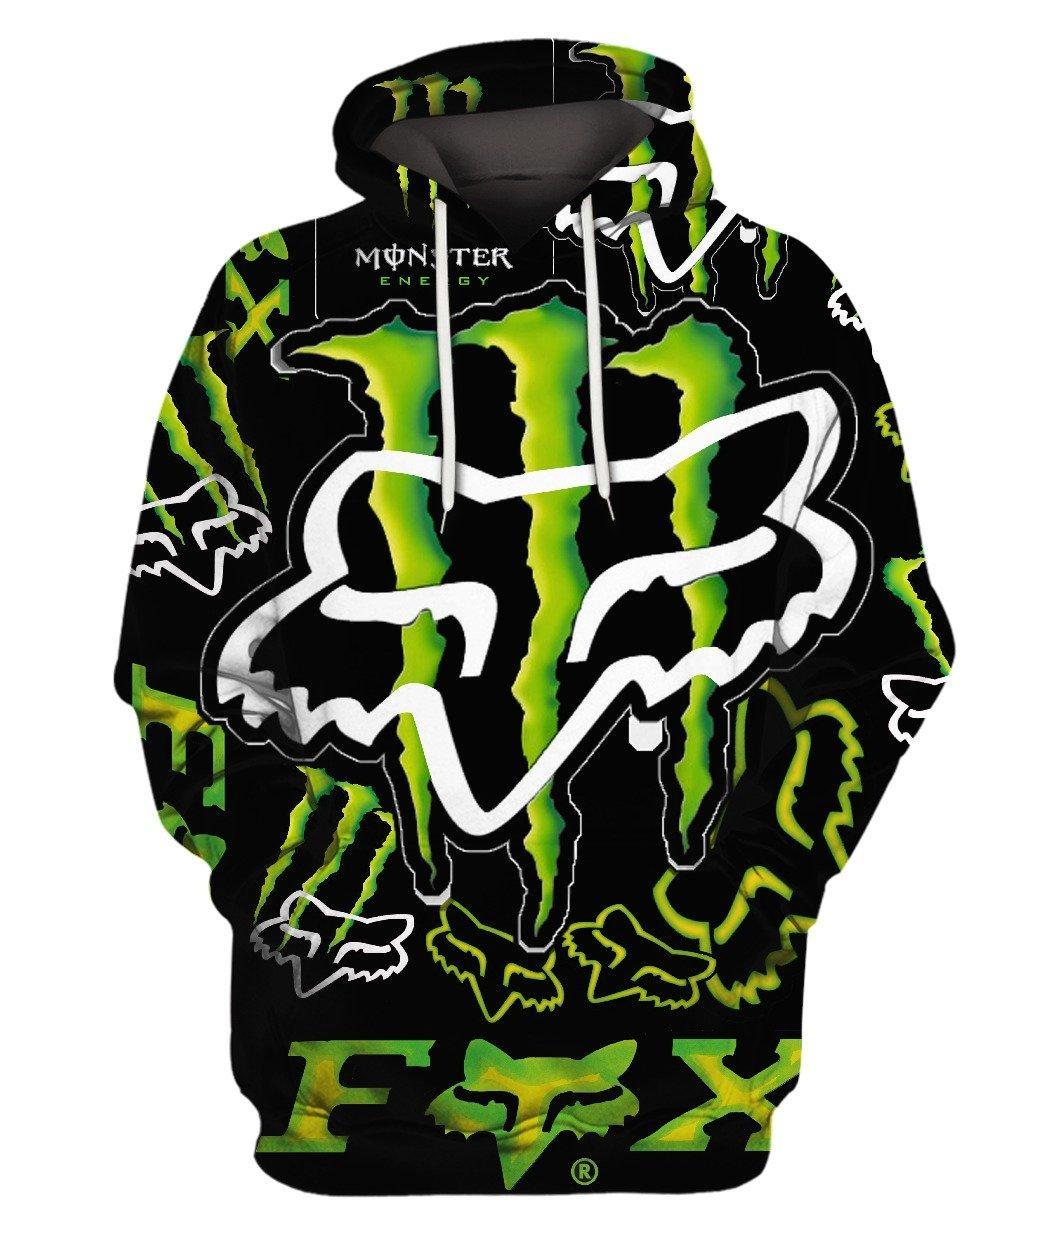 Fox Monster Energy Green 3d Full Print Hoodie 3d Graphic Printed Tshirt Hoodie Up To 5xl